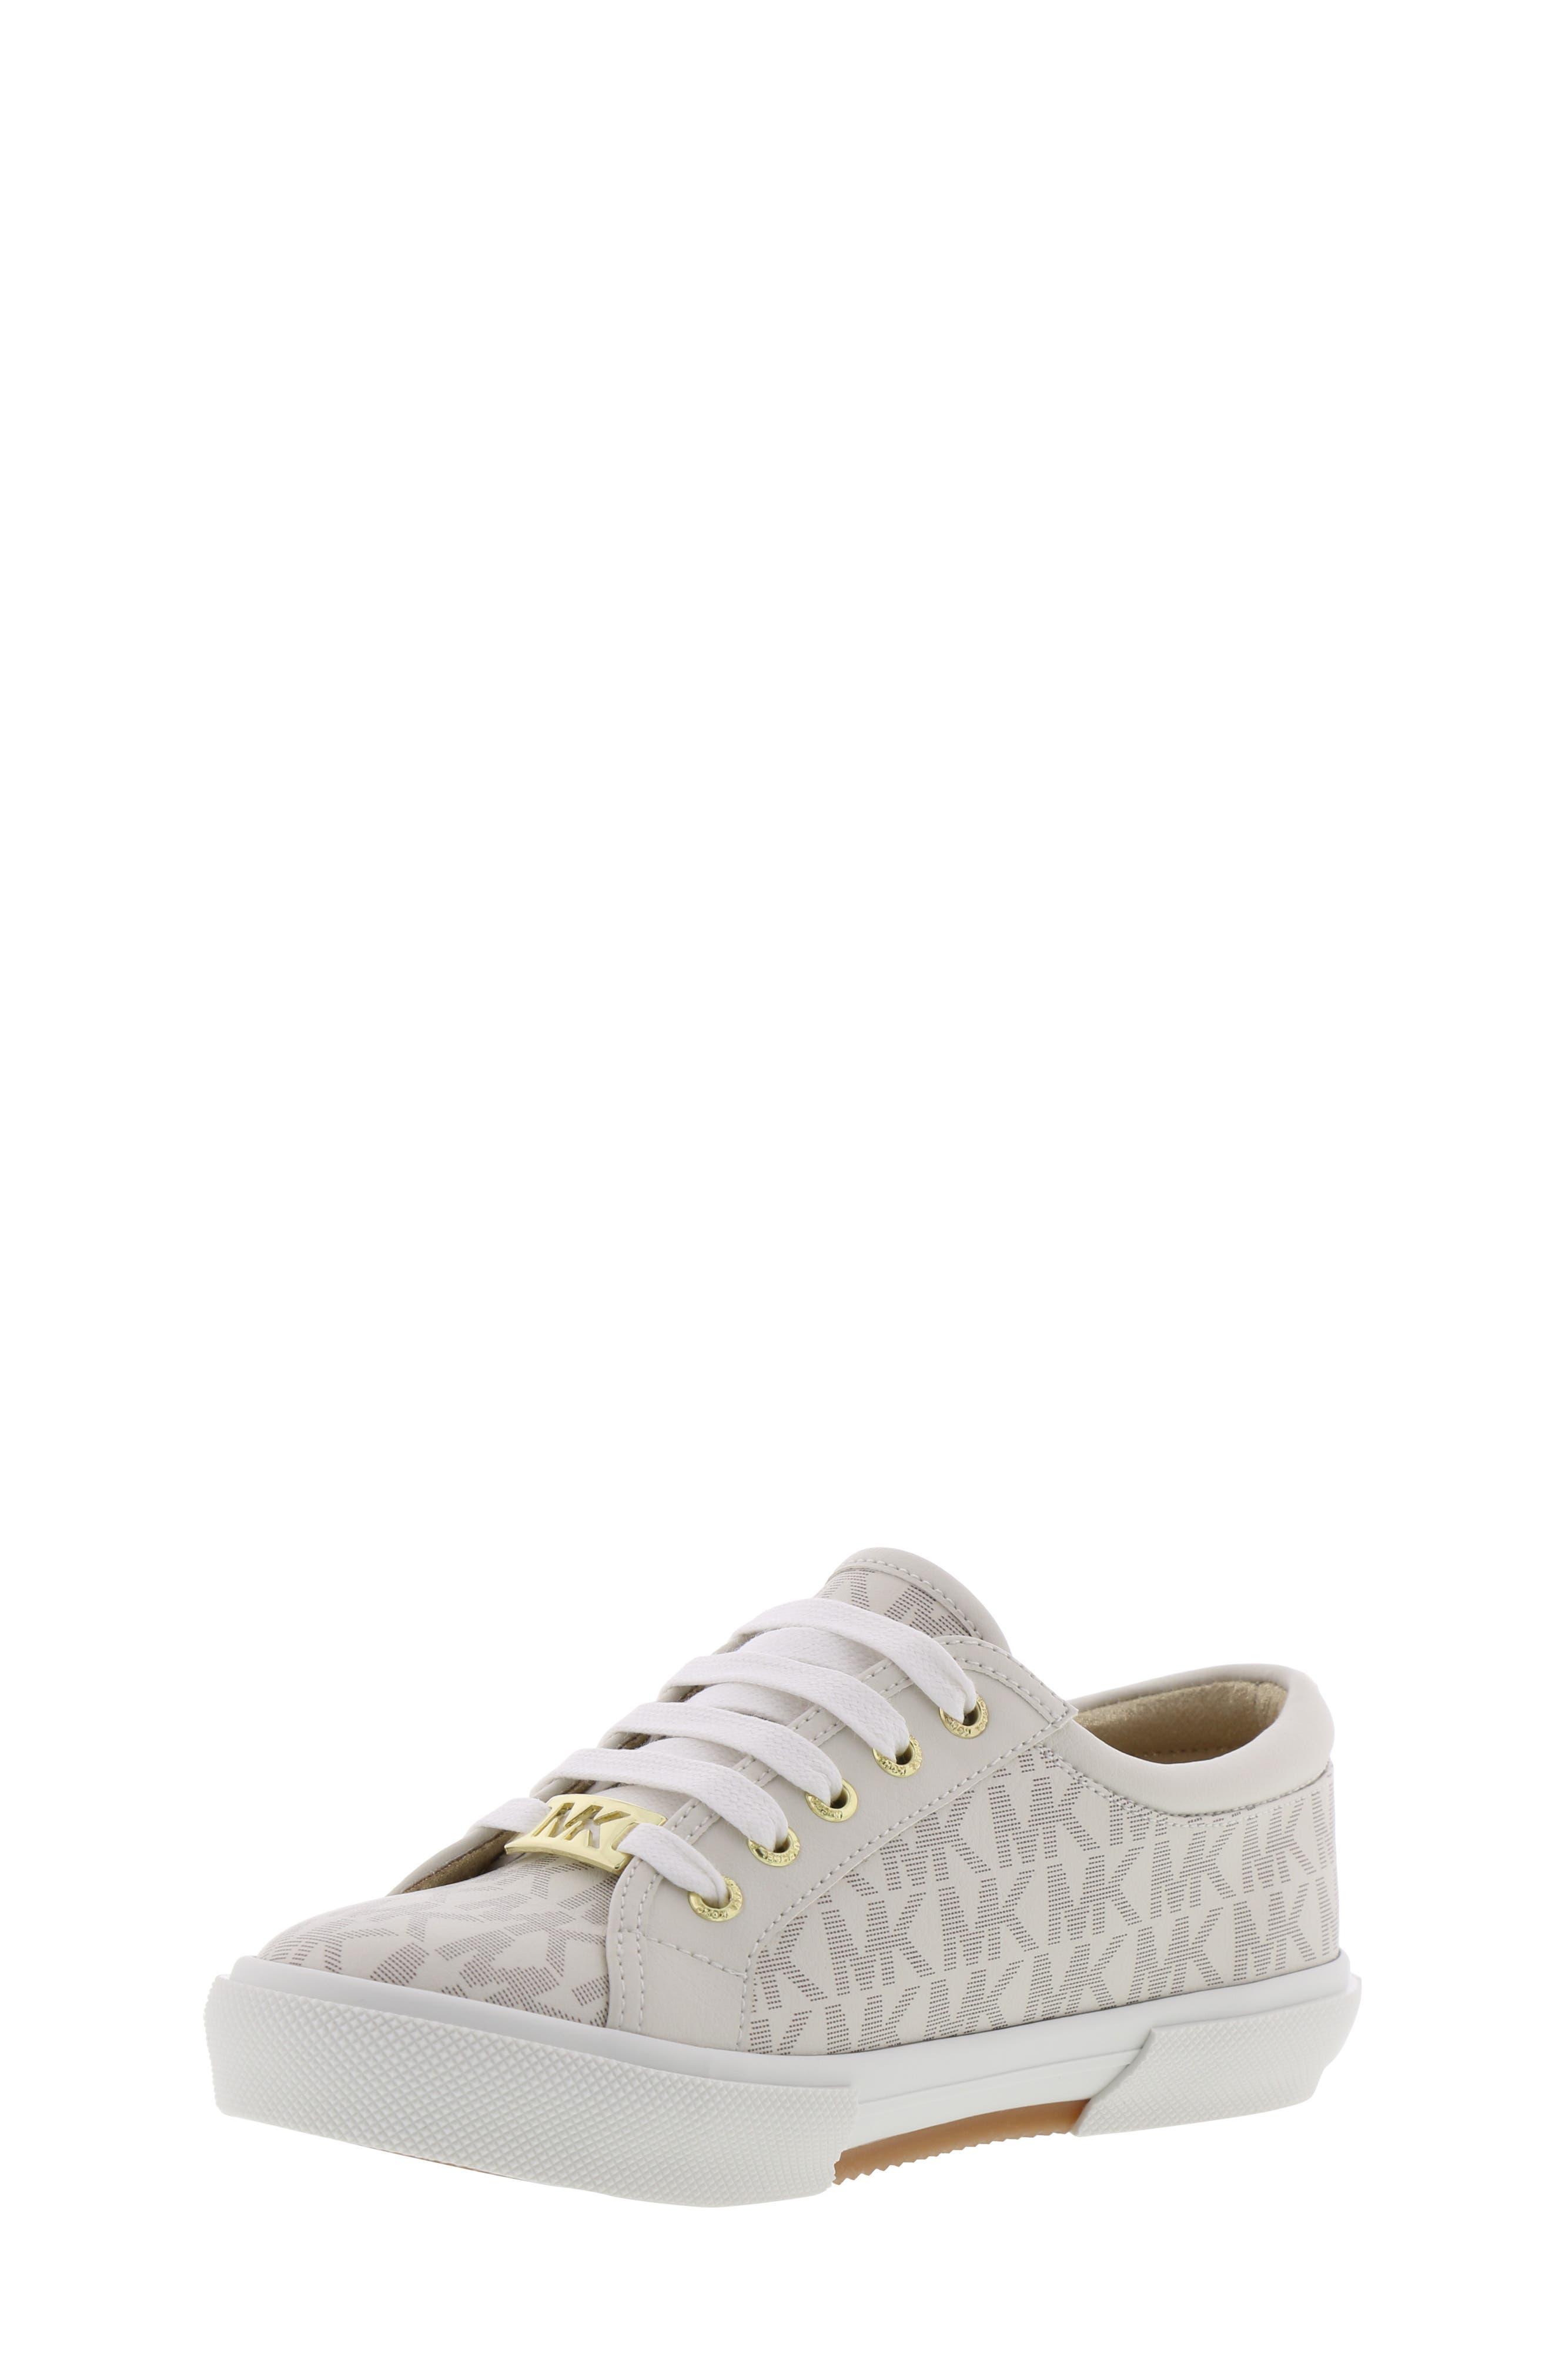 MICHAEL MICHAEL KORS, Ima Rebel Sneaker, Alternate thumbnail 8, color, VANILLA